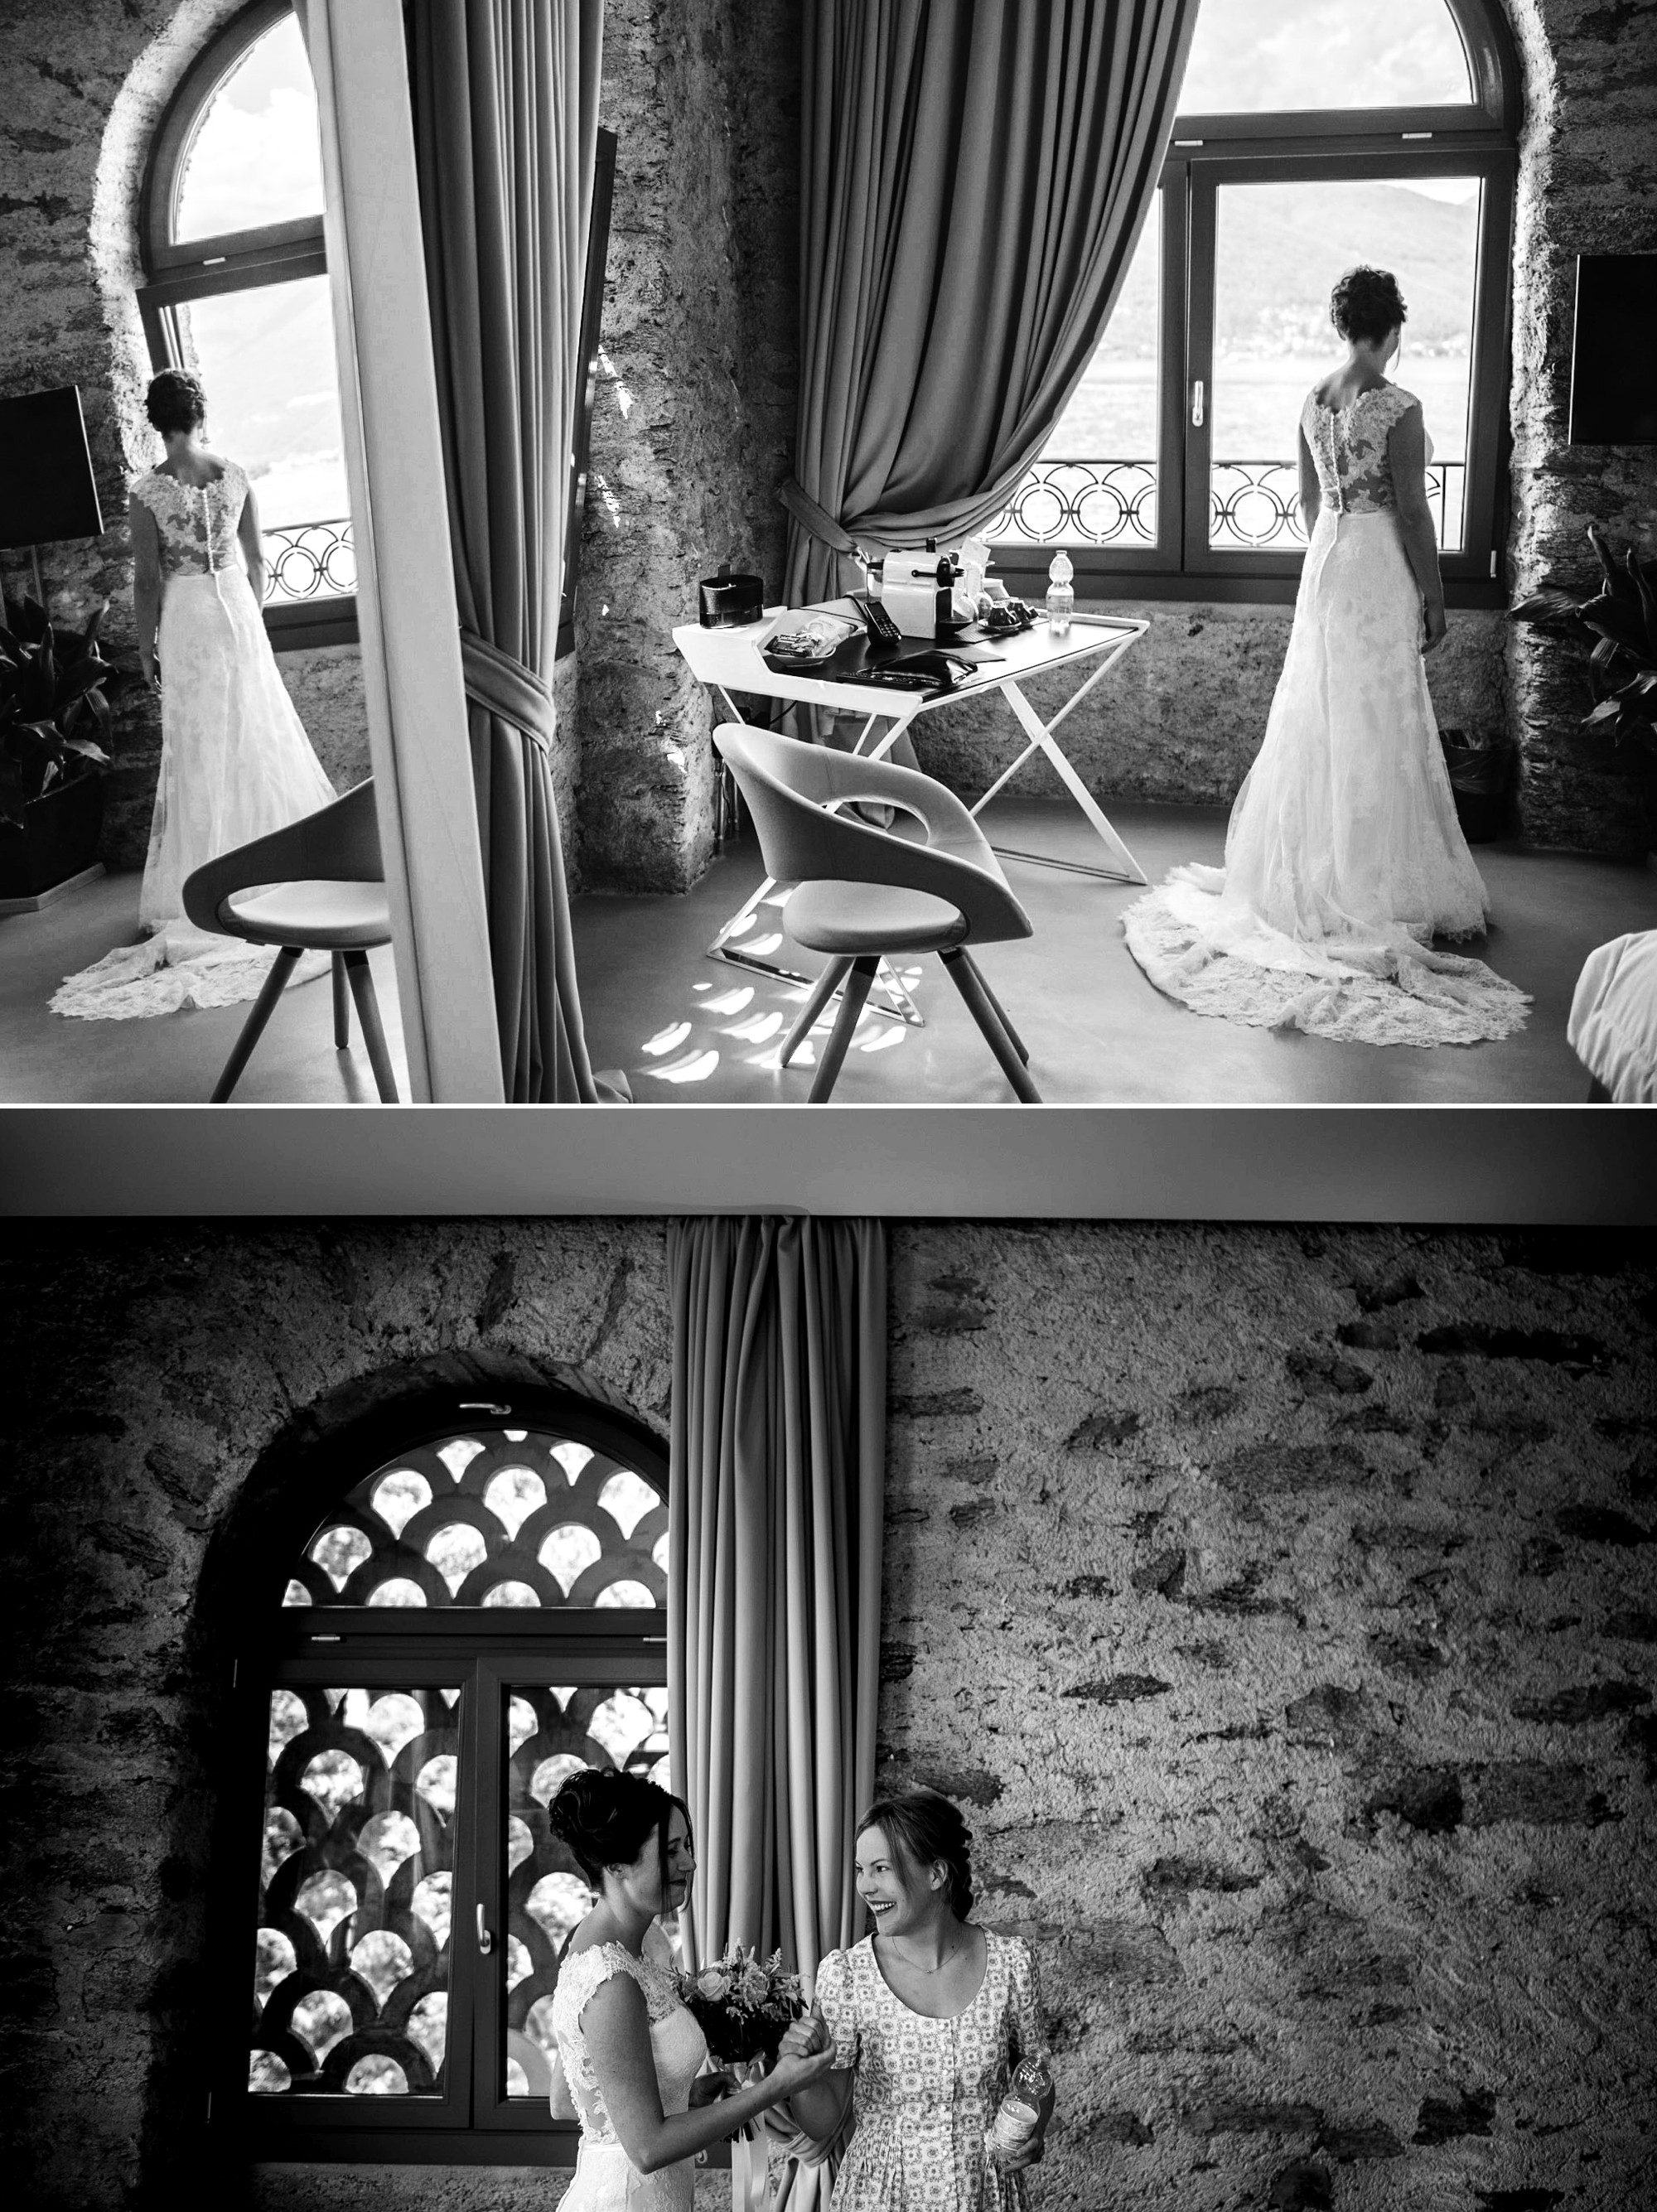 Wedding photography photos in Lake Maggiore